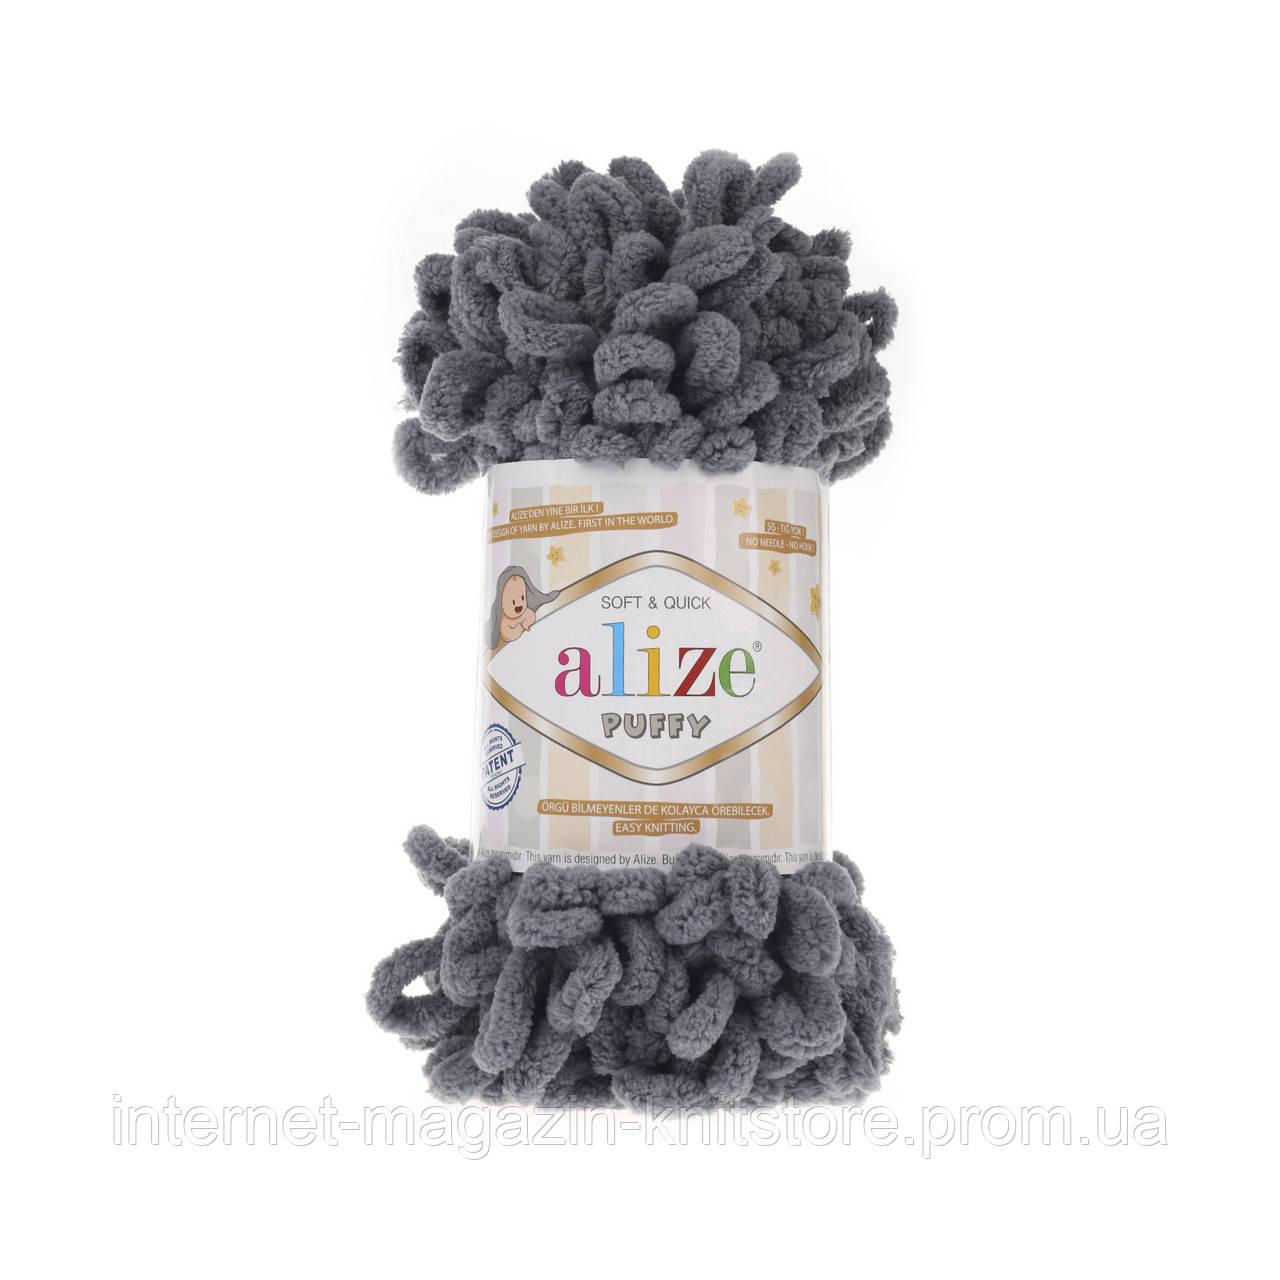 Пряжа Alize Puffy Серый